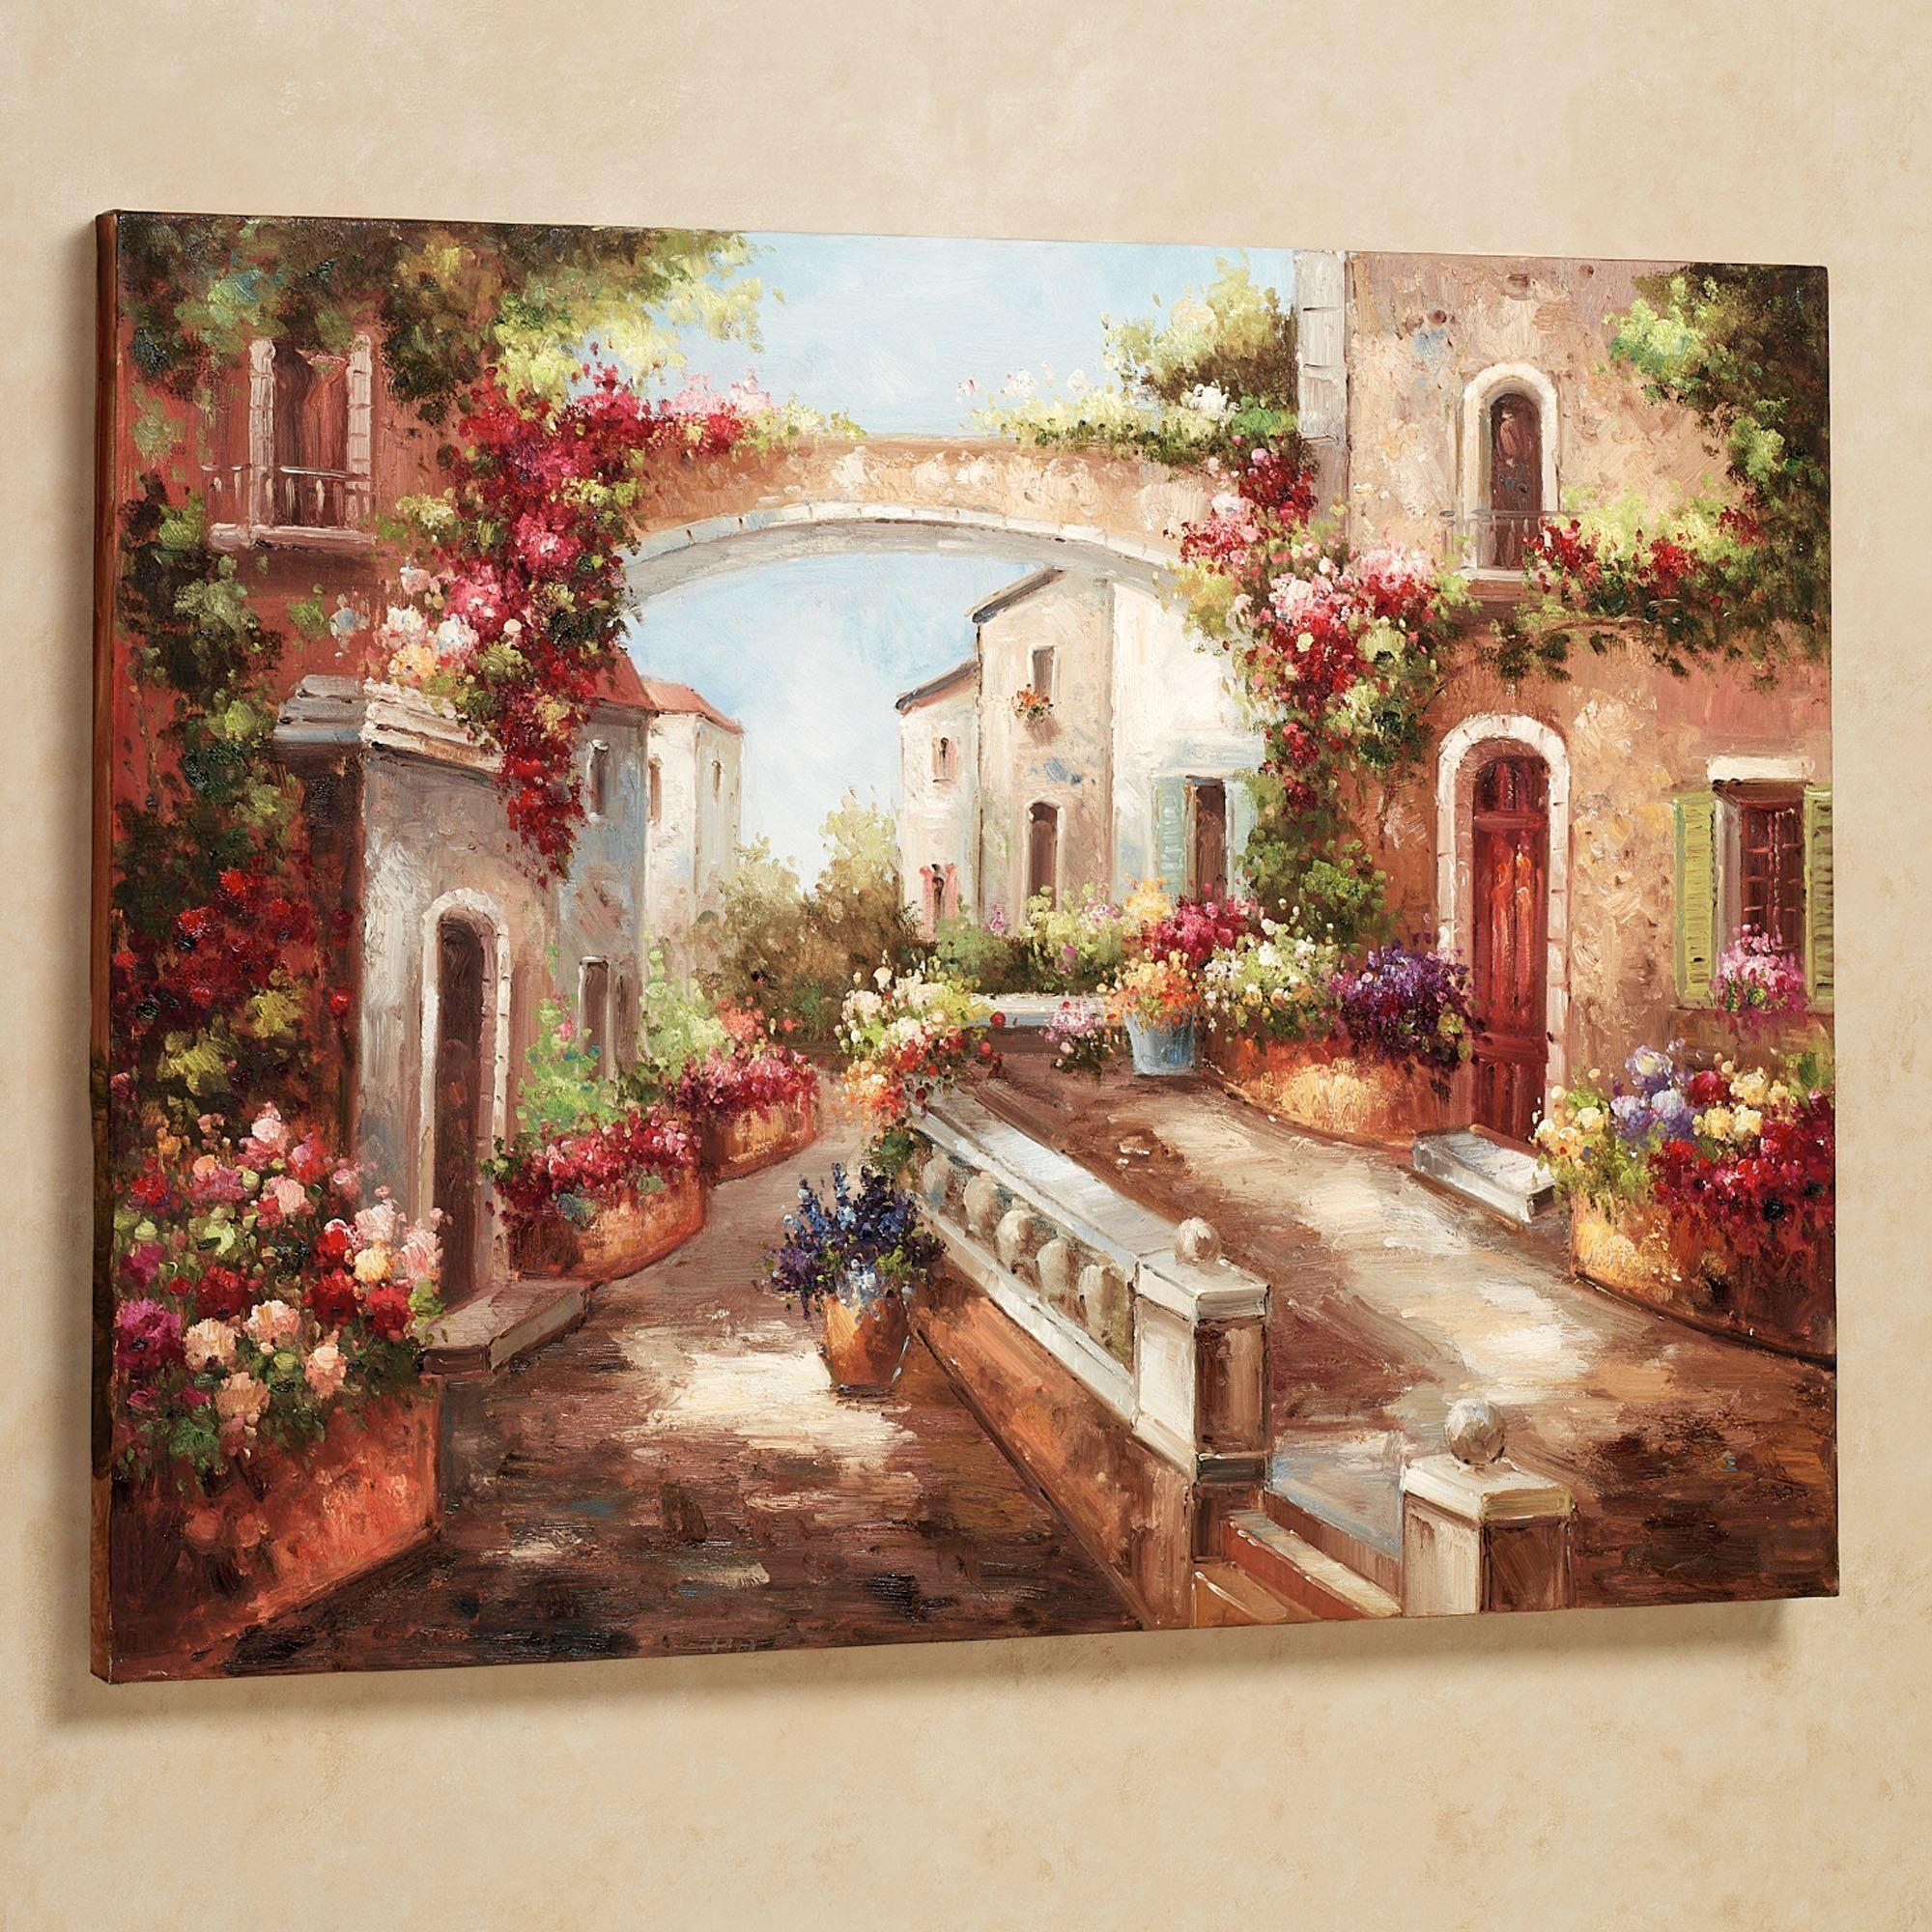 Italian Wall Art Small Home Decoration Ideas Elegant – Lovely Home Inside Old Italian Wall Art (Image 7 of 20)